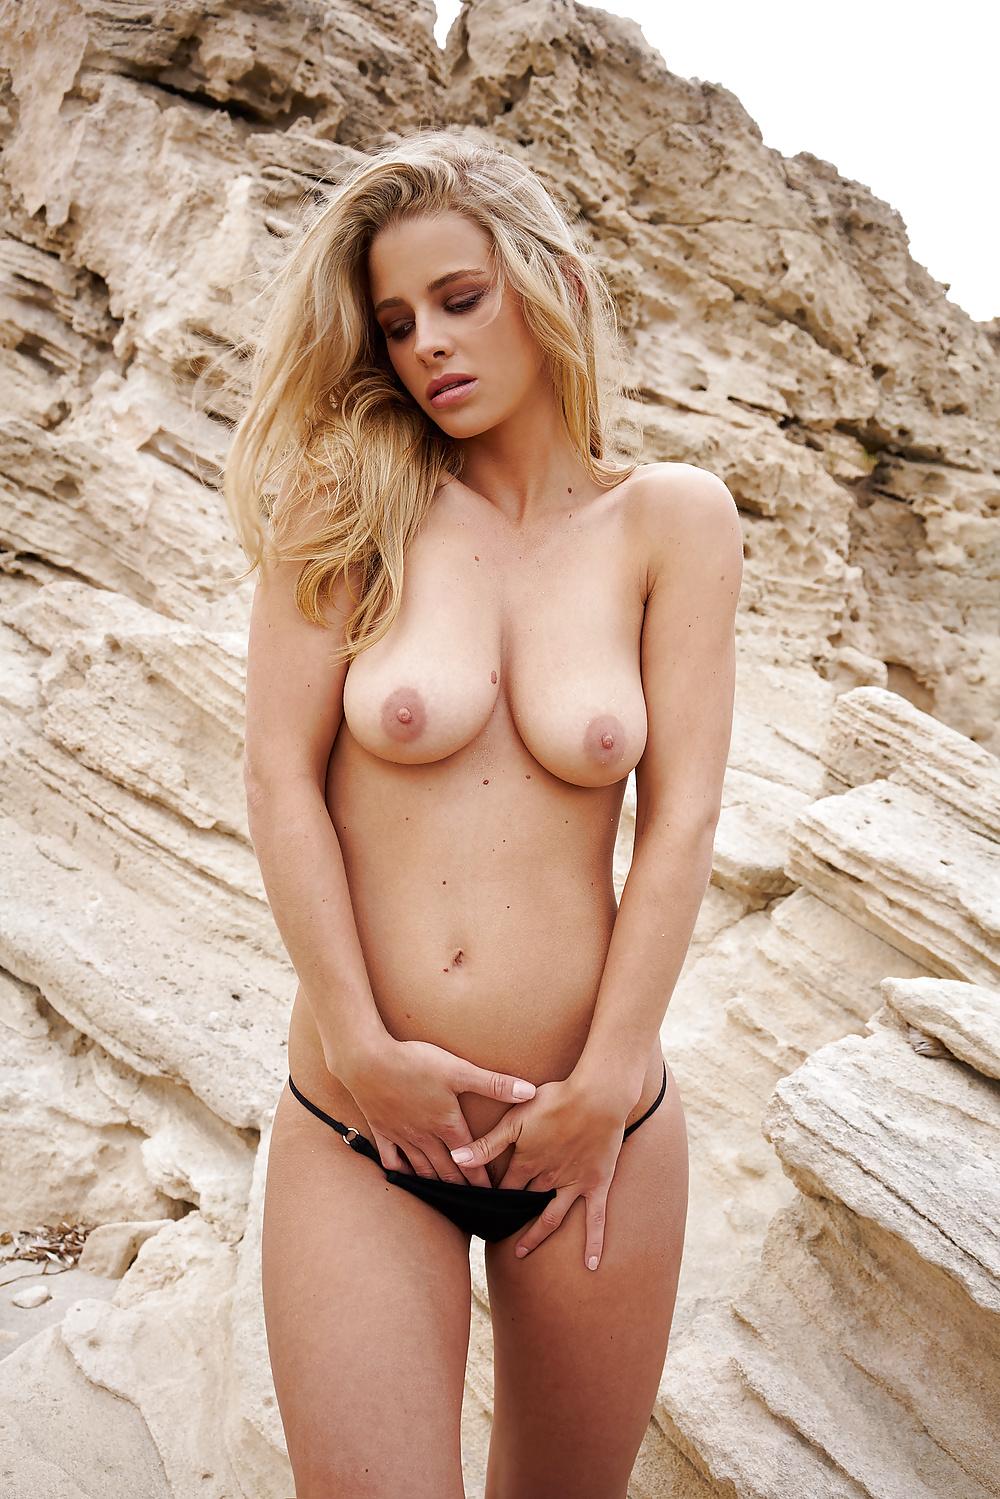 Saskia reeves nude bush and sex helen fitzgerald nude